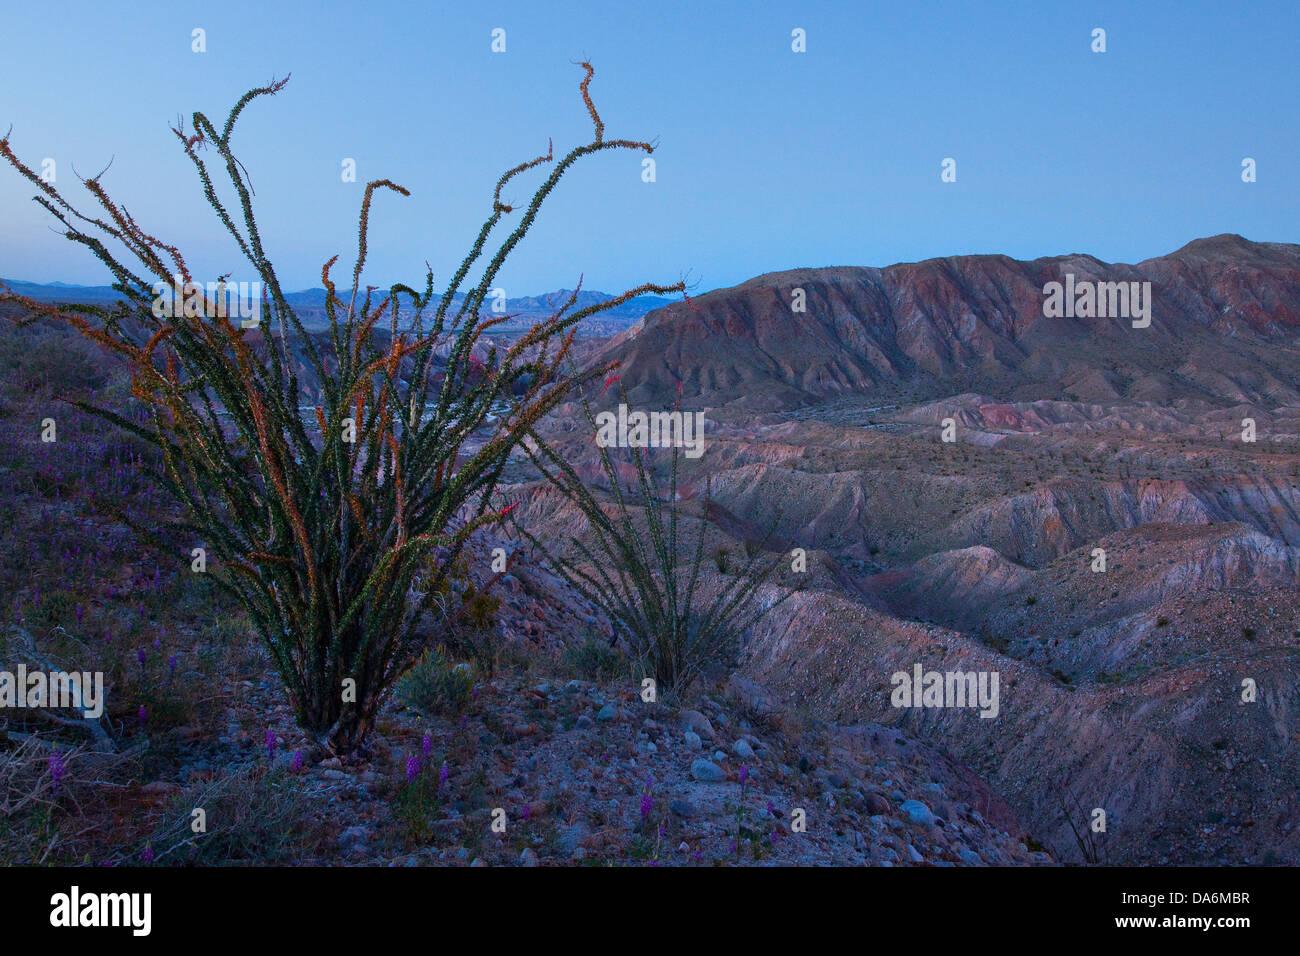 Usa united states america california borrego springs borrego usa united states america california borrego springs borrego anza borrego desert state park wildflowers spring flower mightylinksfo Images